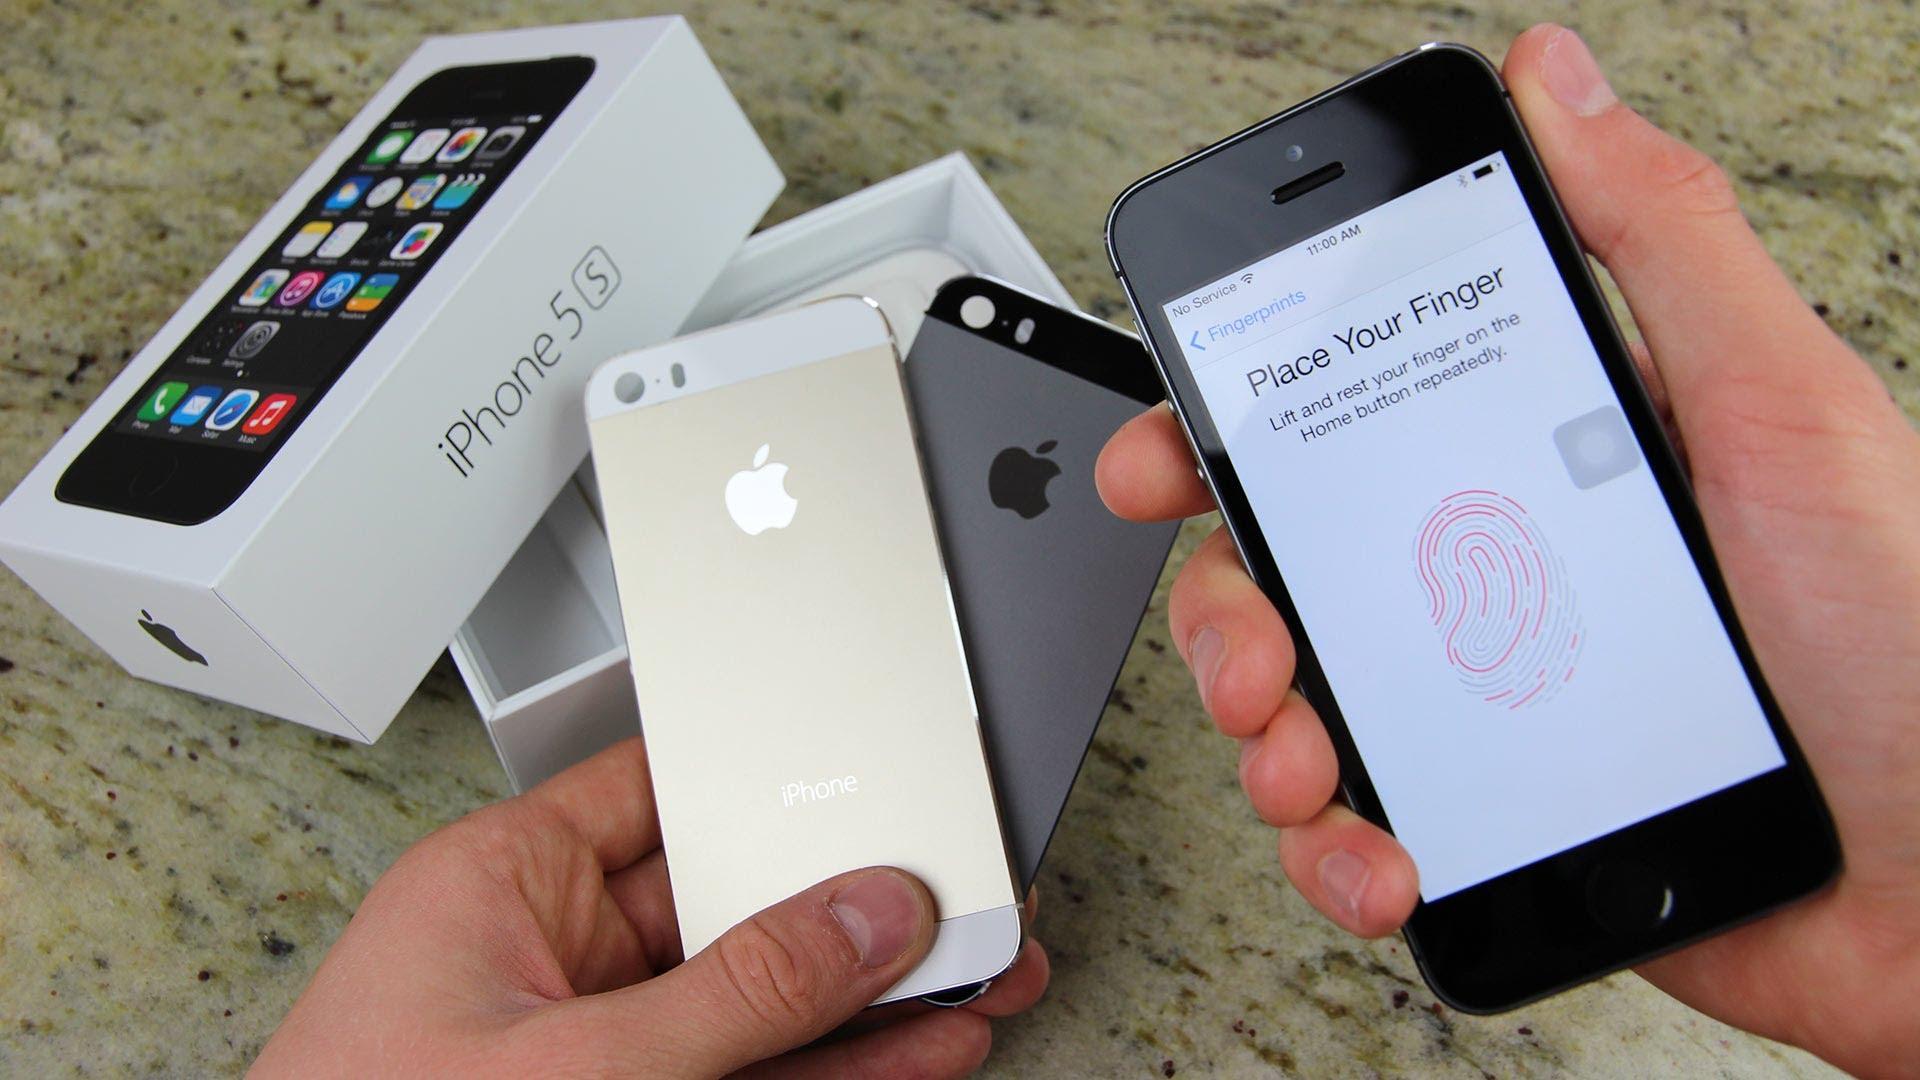 Mobile Phones (Unlocked Apple iPhone 5s 16gb/32gb/64gb)